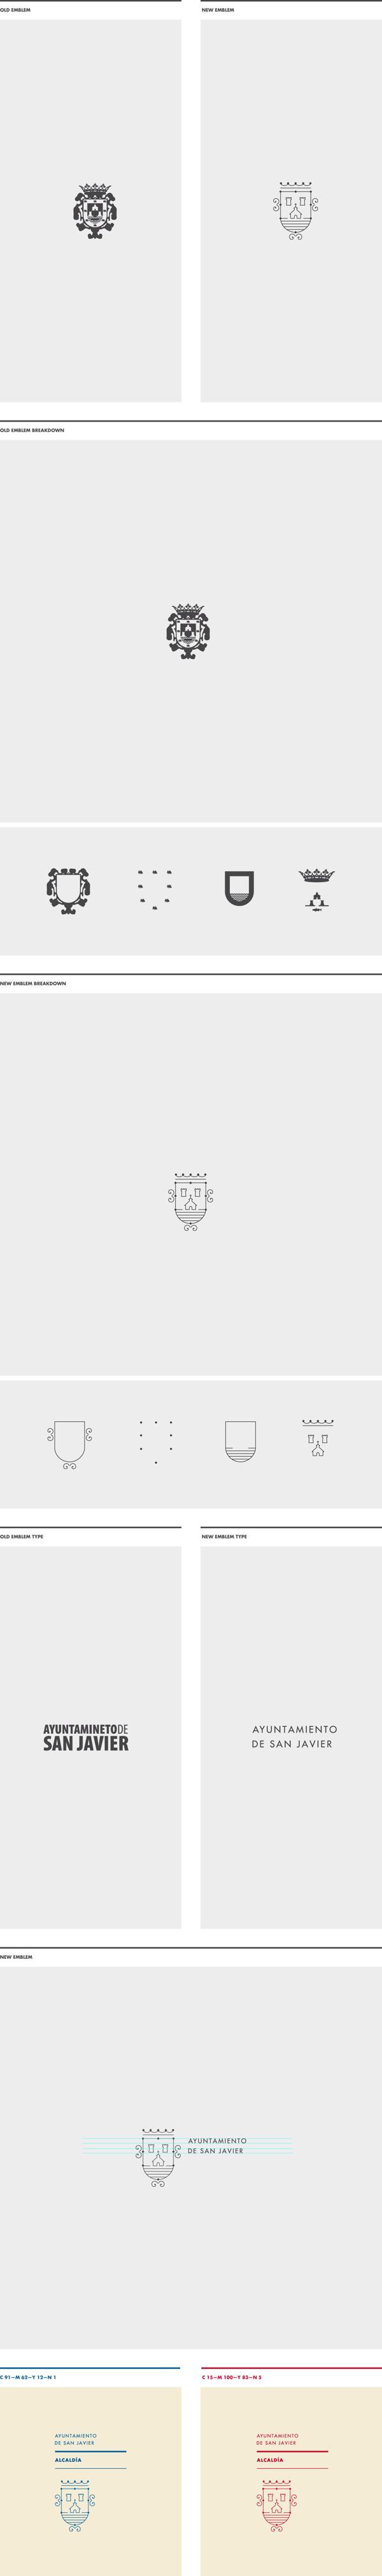 San Javier Emblem Redesign Proposal By Jose álvarez Carratalá Via Behance Logo Design San Emblems